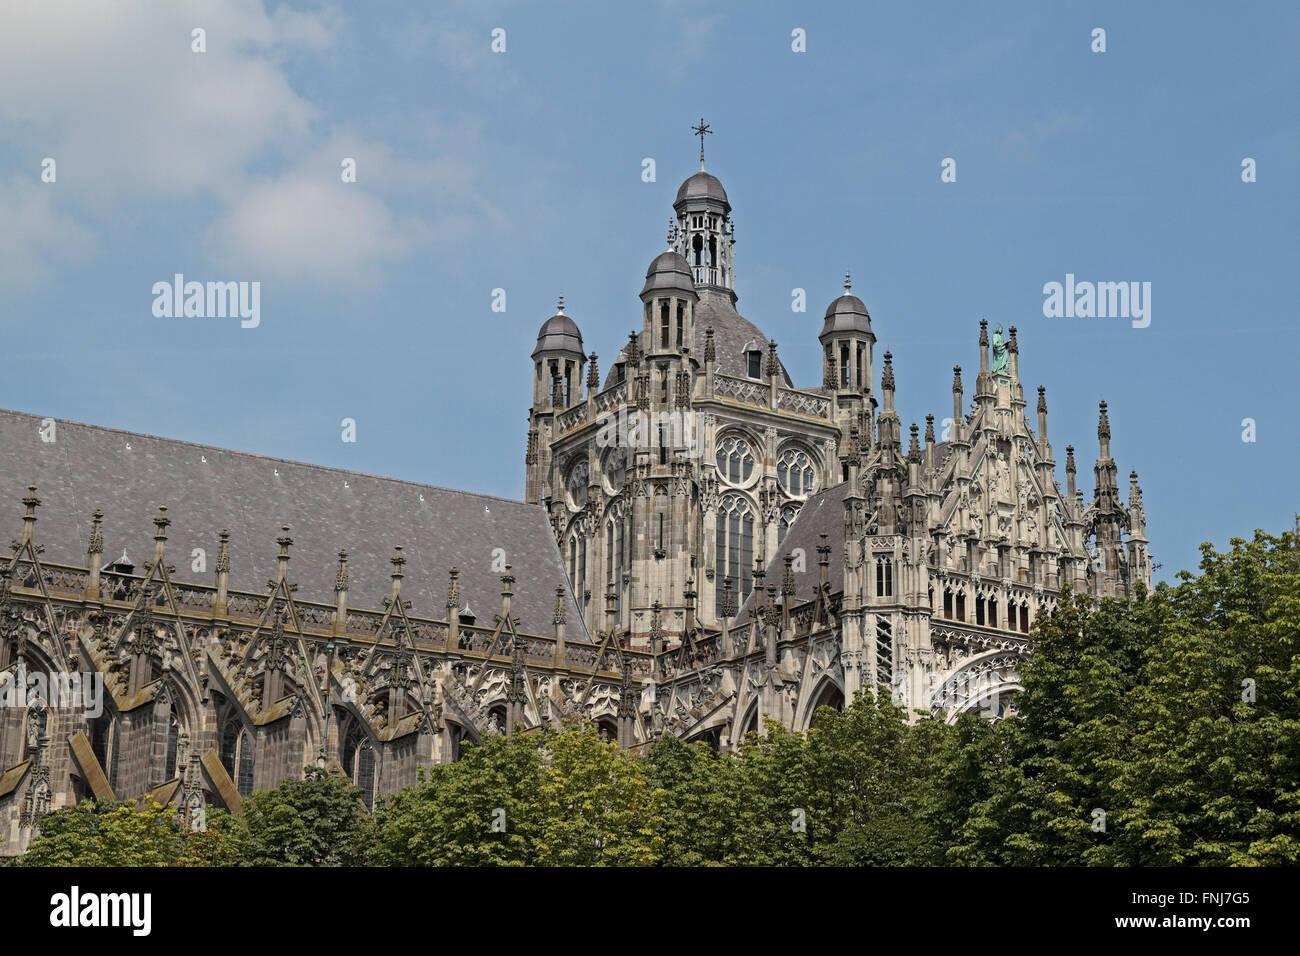 ´s Hertogenbosch Holland NetherlandsStock Photos and Images